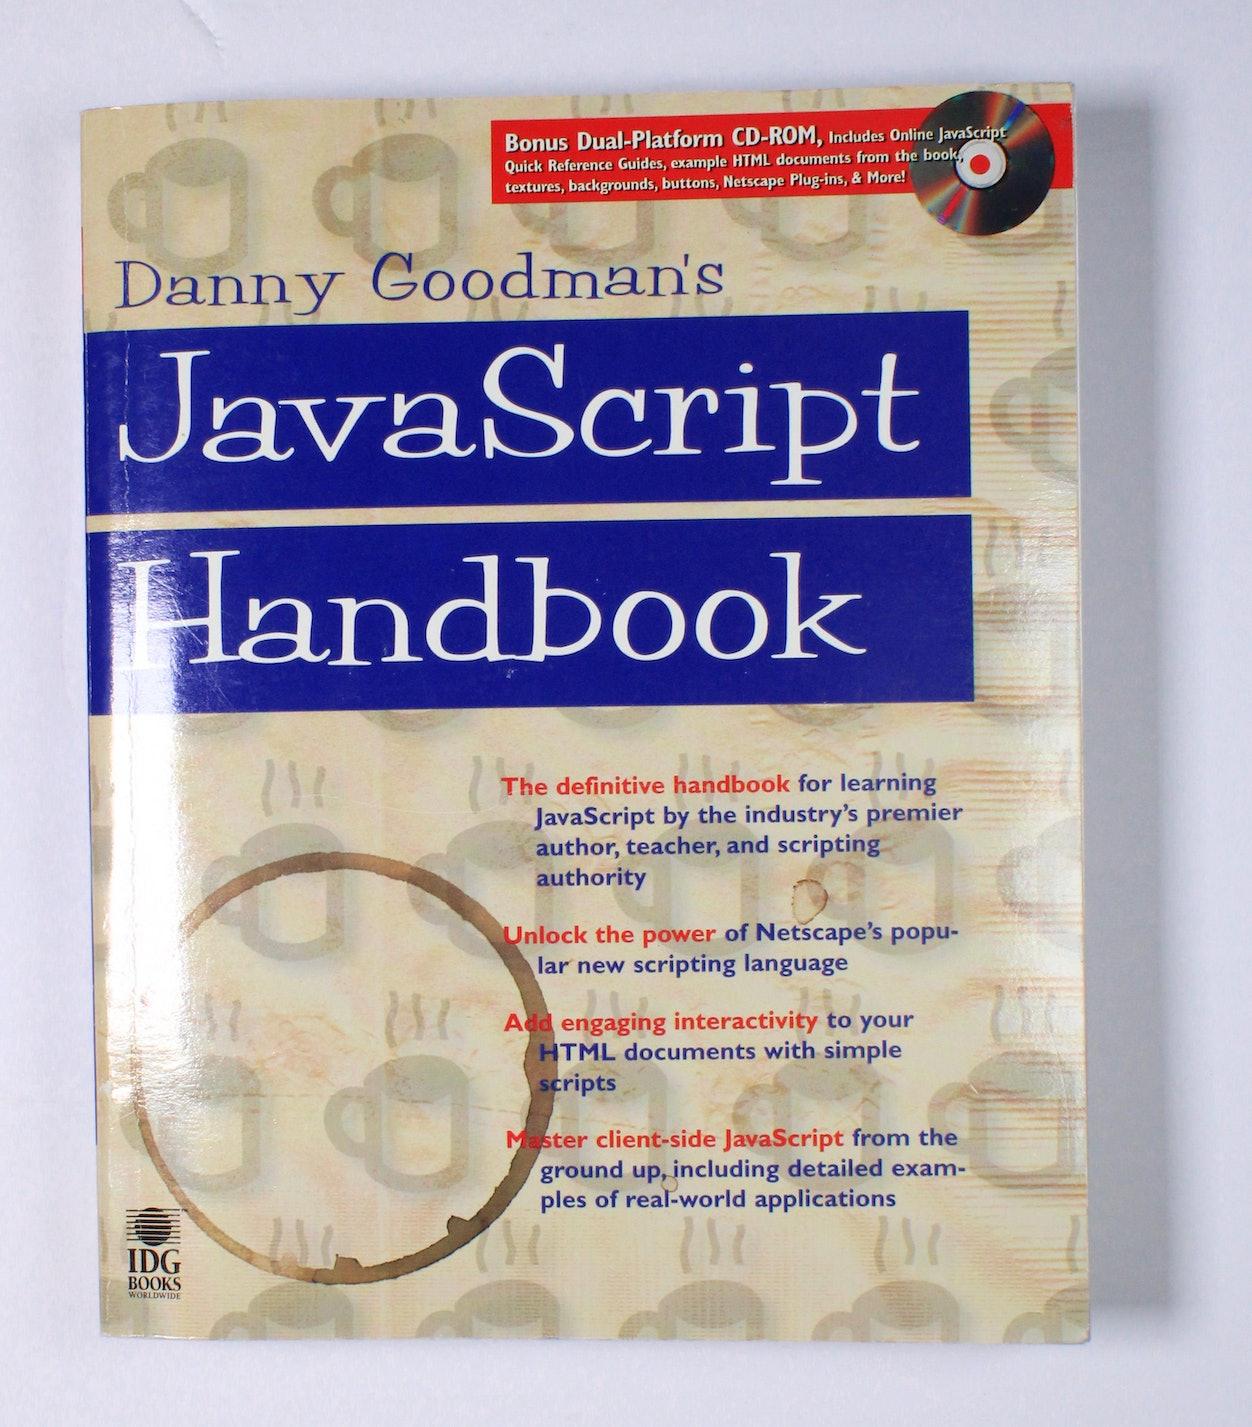 Danny Goodman's JavaScript Handbook